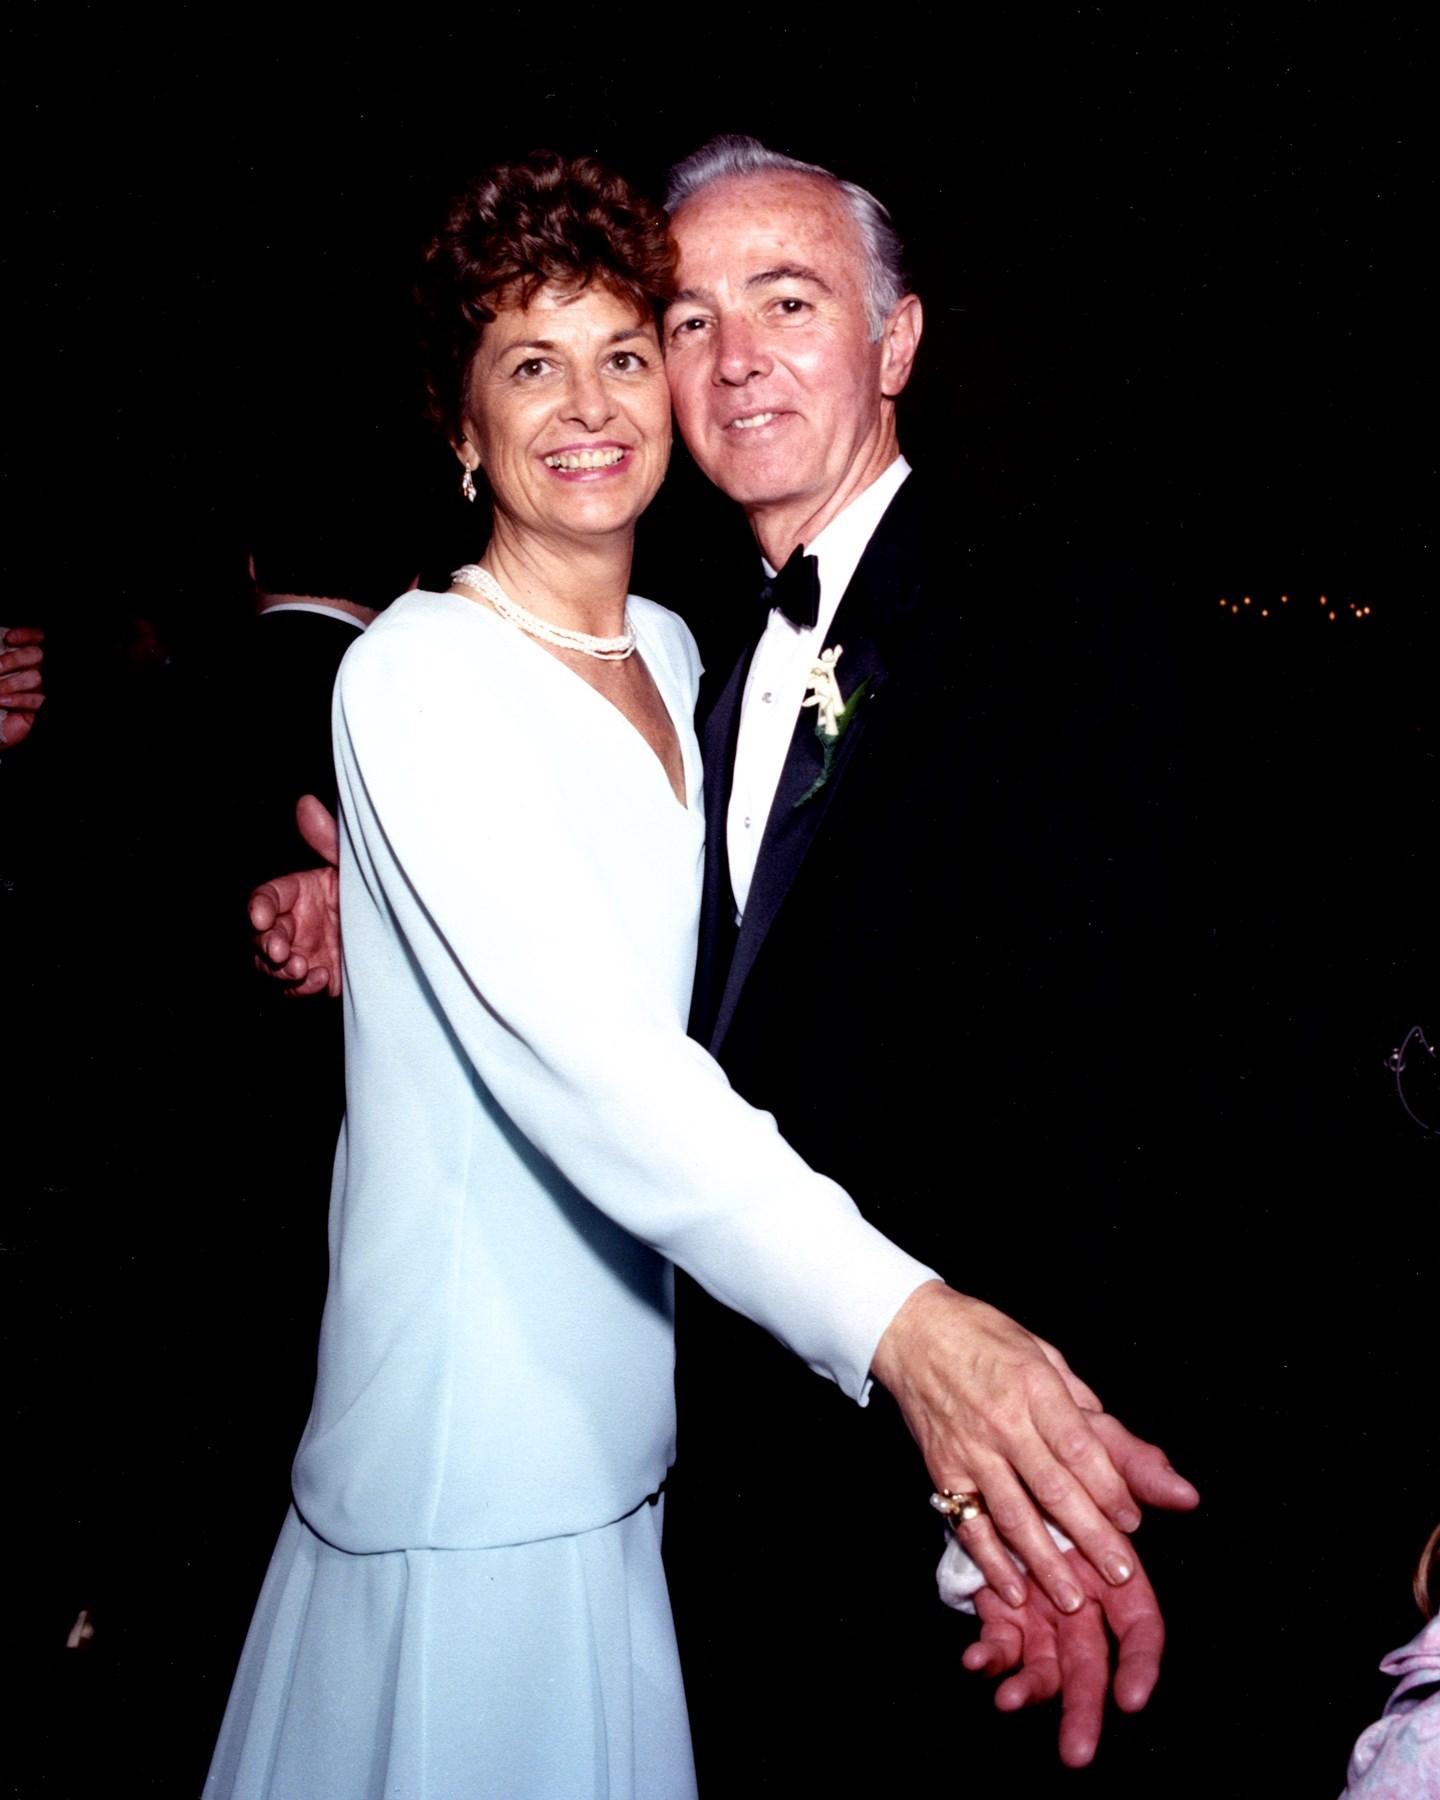 William george flower obituary yonkers ny izmirmasajfo